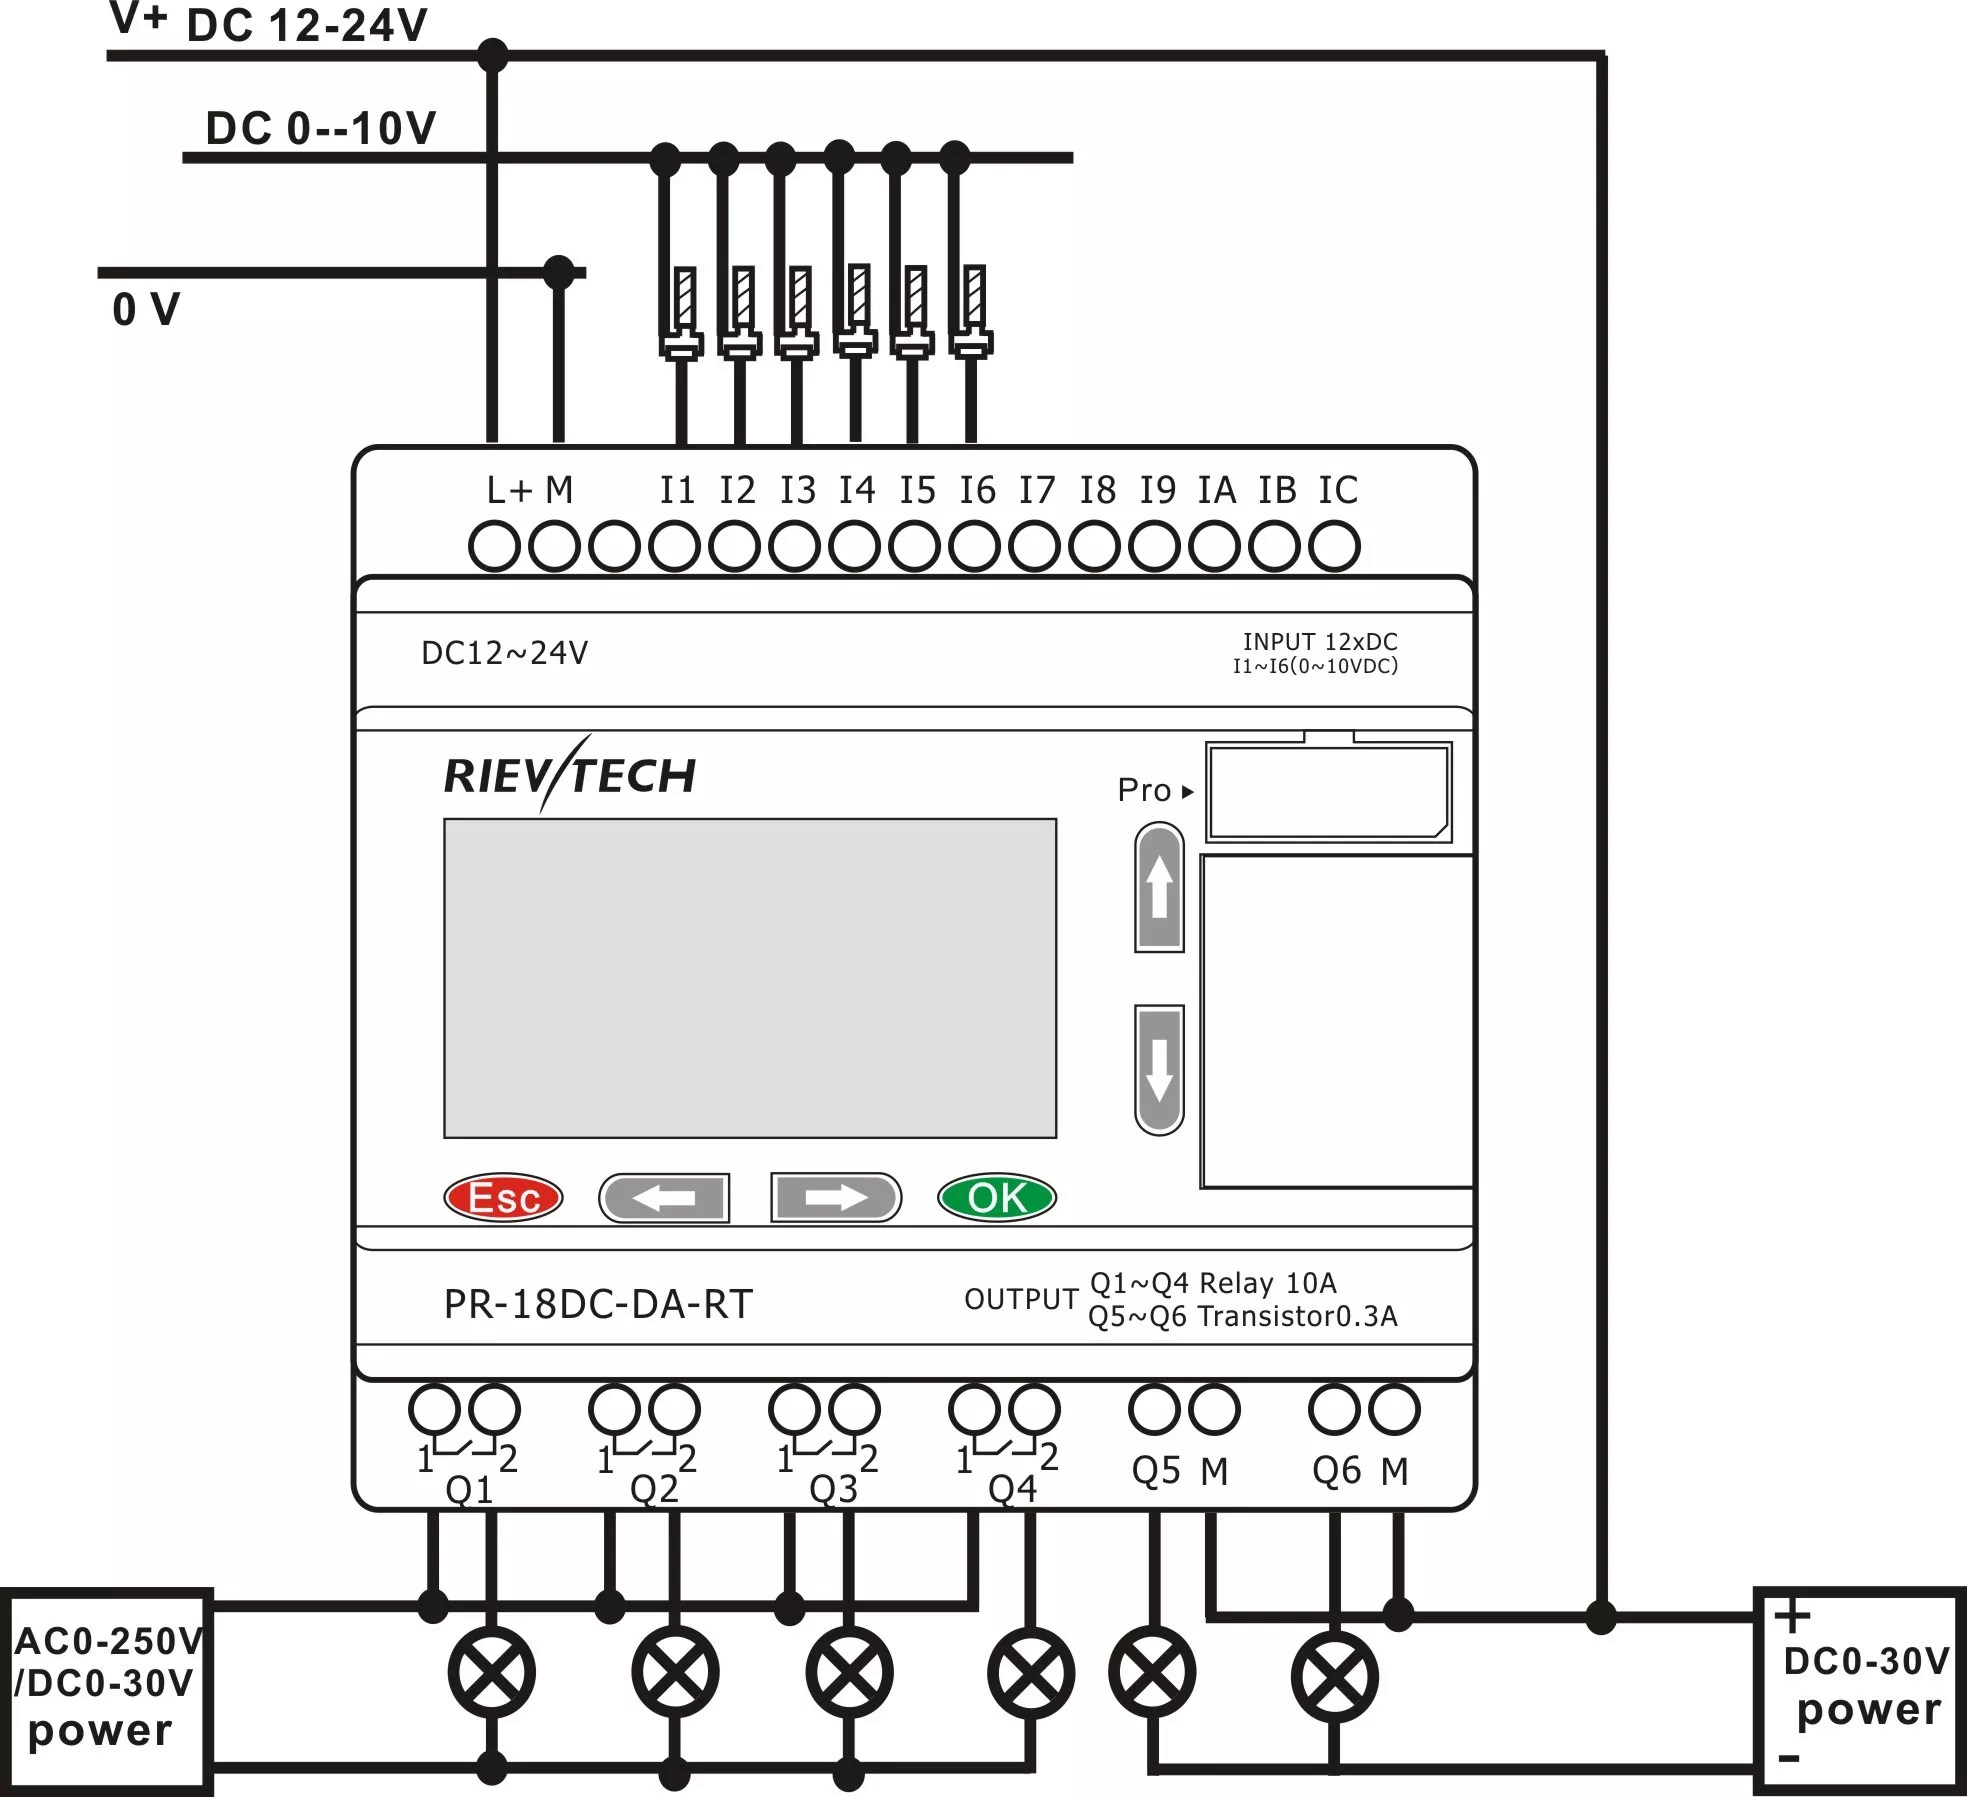 wiring diagram plc siemens 1999 honda accord ecu esp200 free engine image